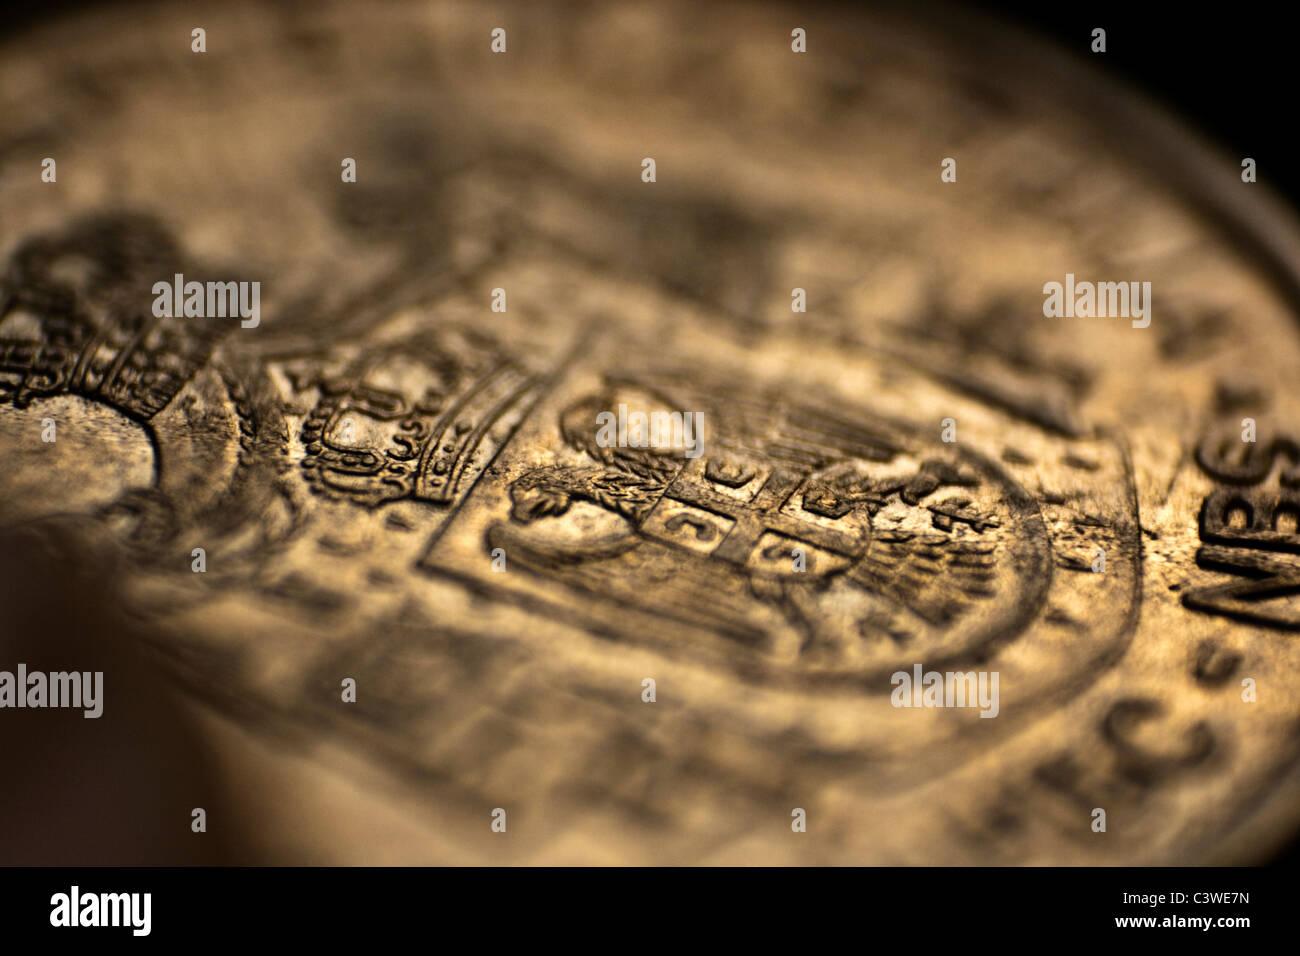 Serbian money - Dinar (close up of a coin) - Stock Image